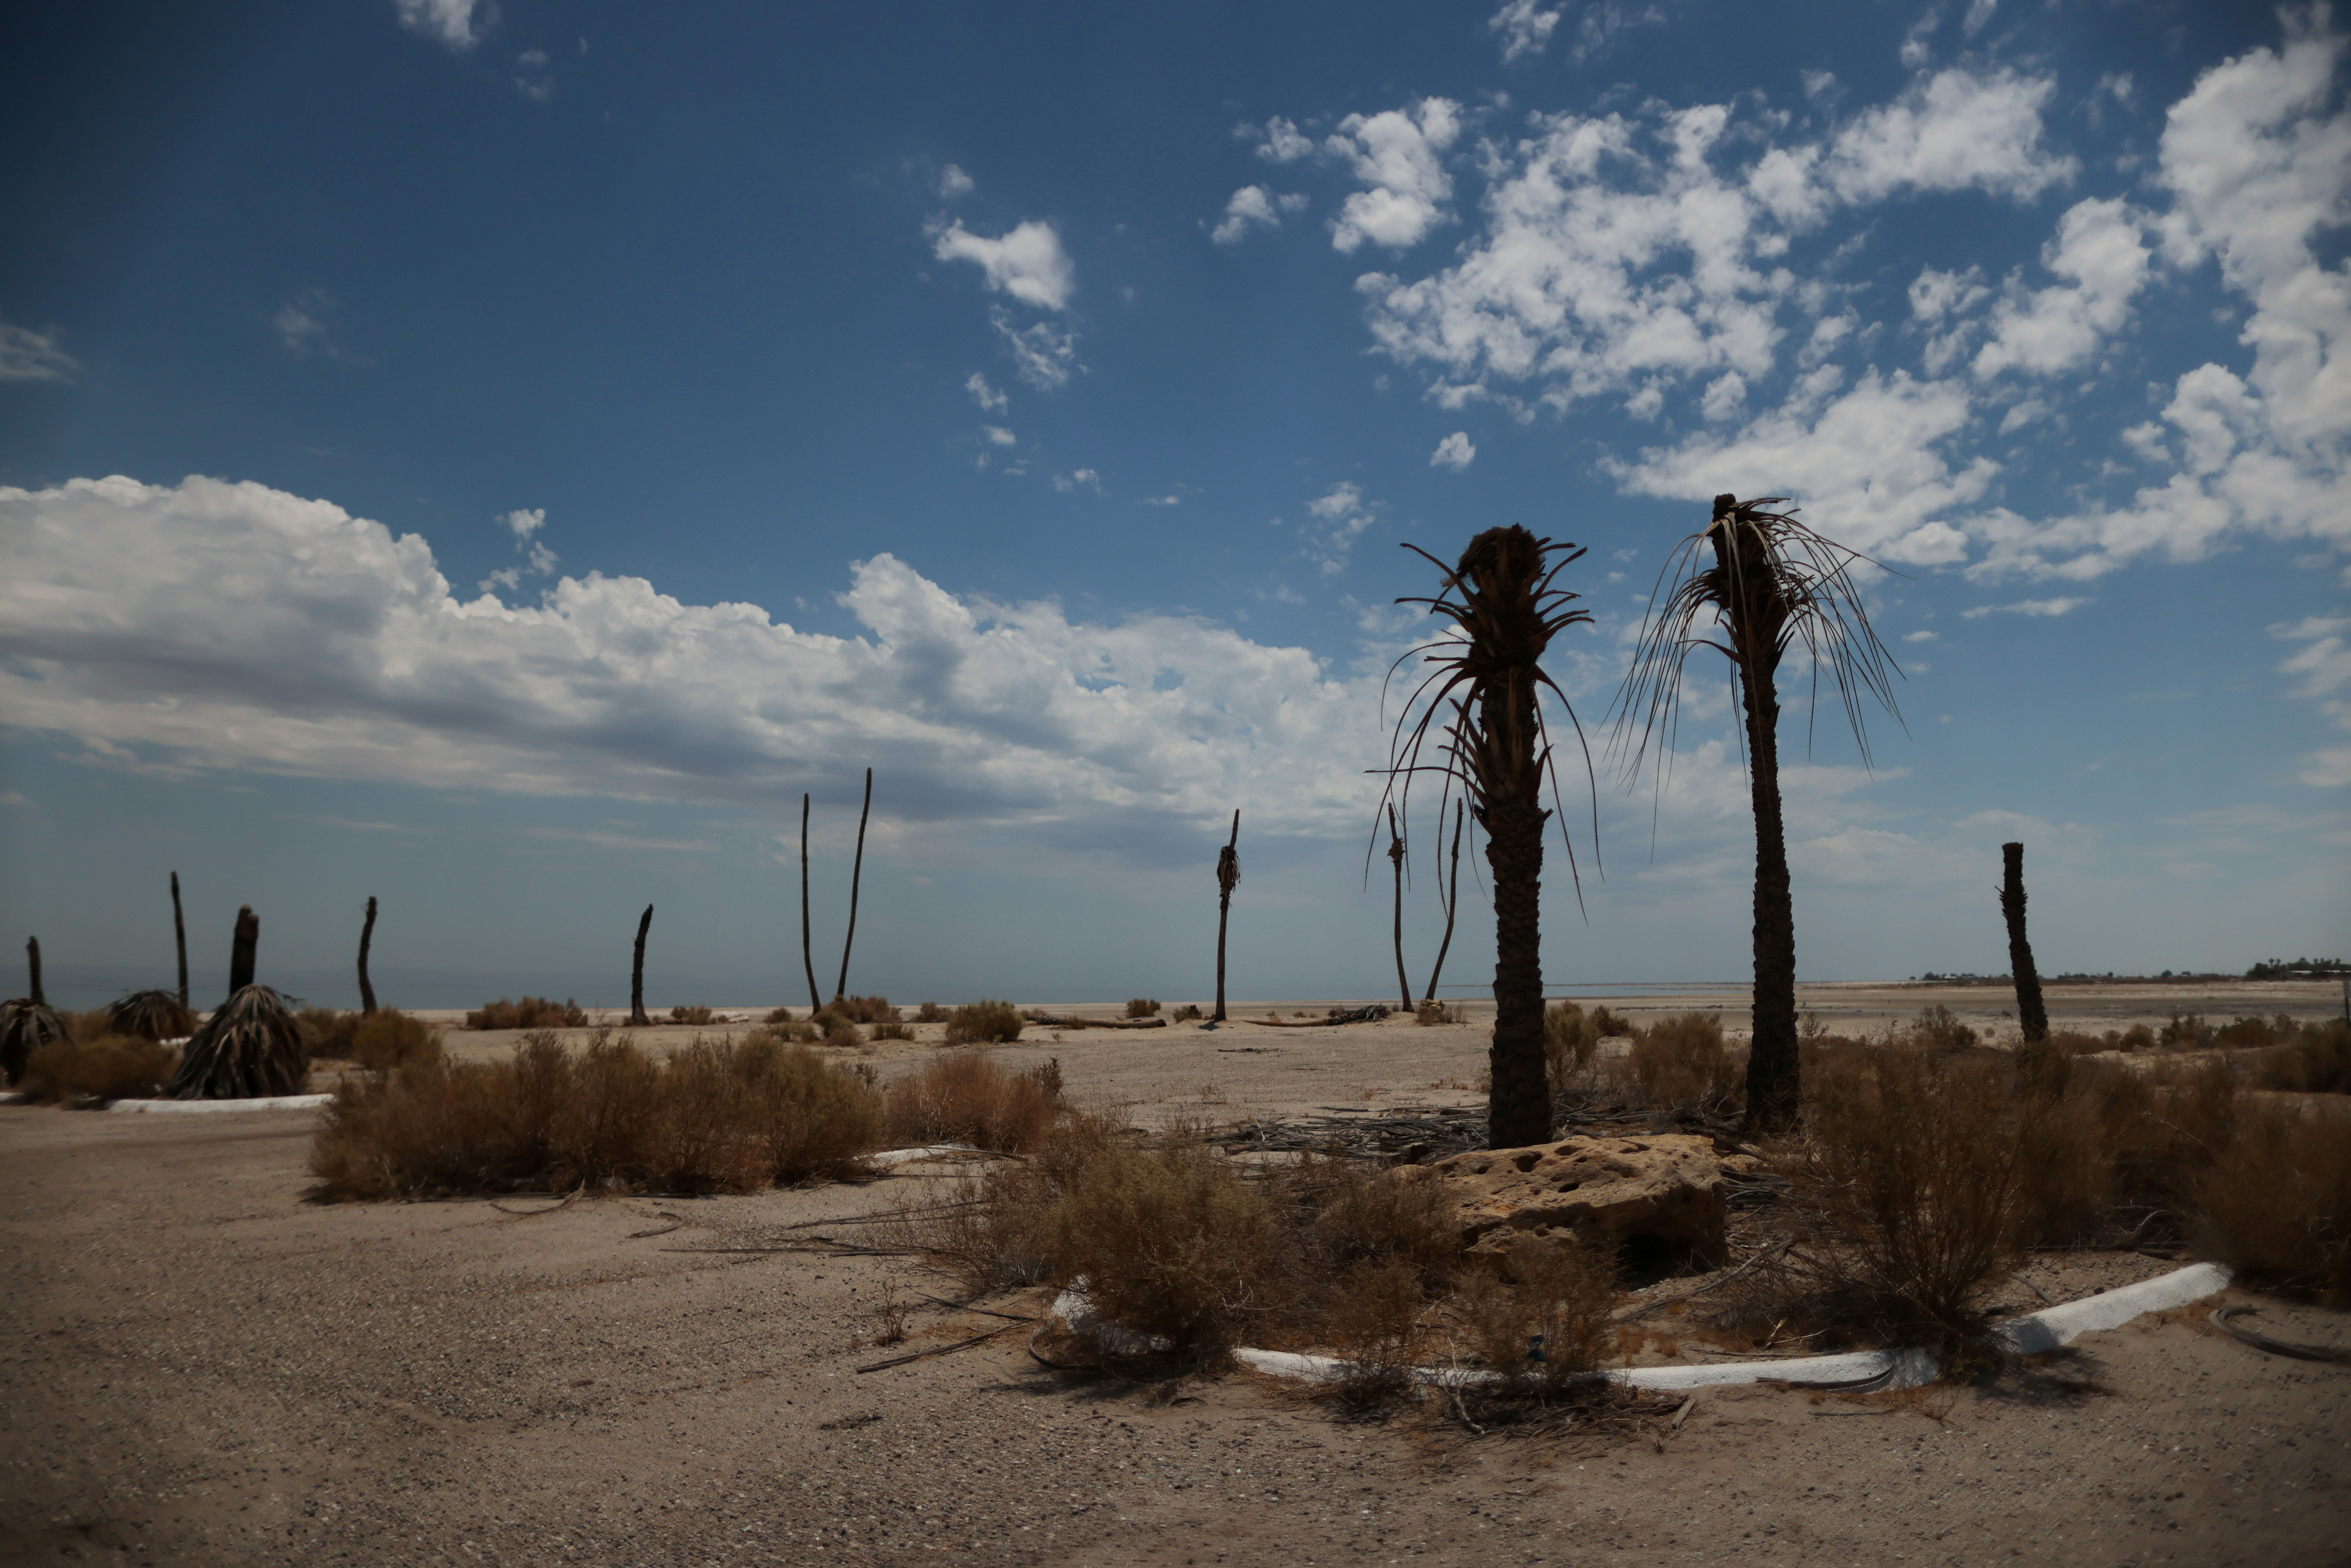 Dead palm trees are seen near the beaches of the Salton Sea, as California faces its worst drought since 1977, in Salton City, California, U.S